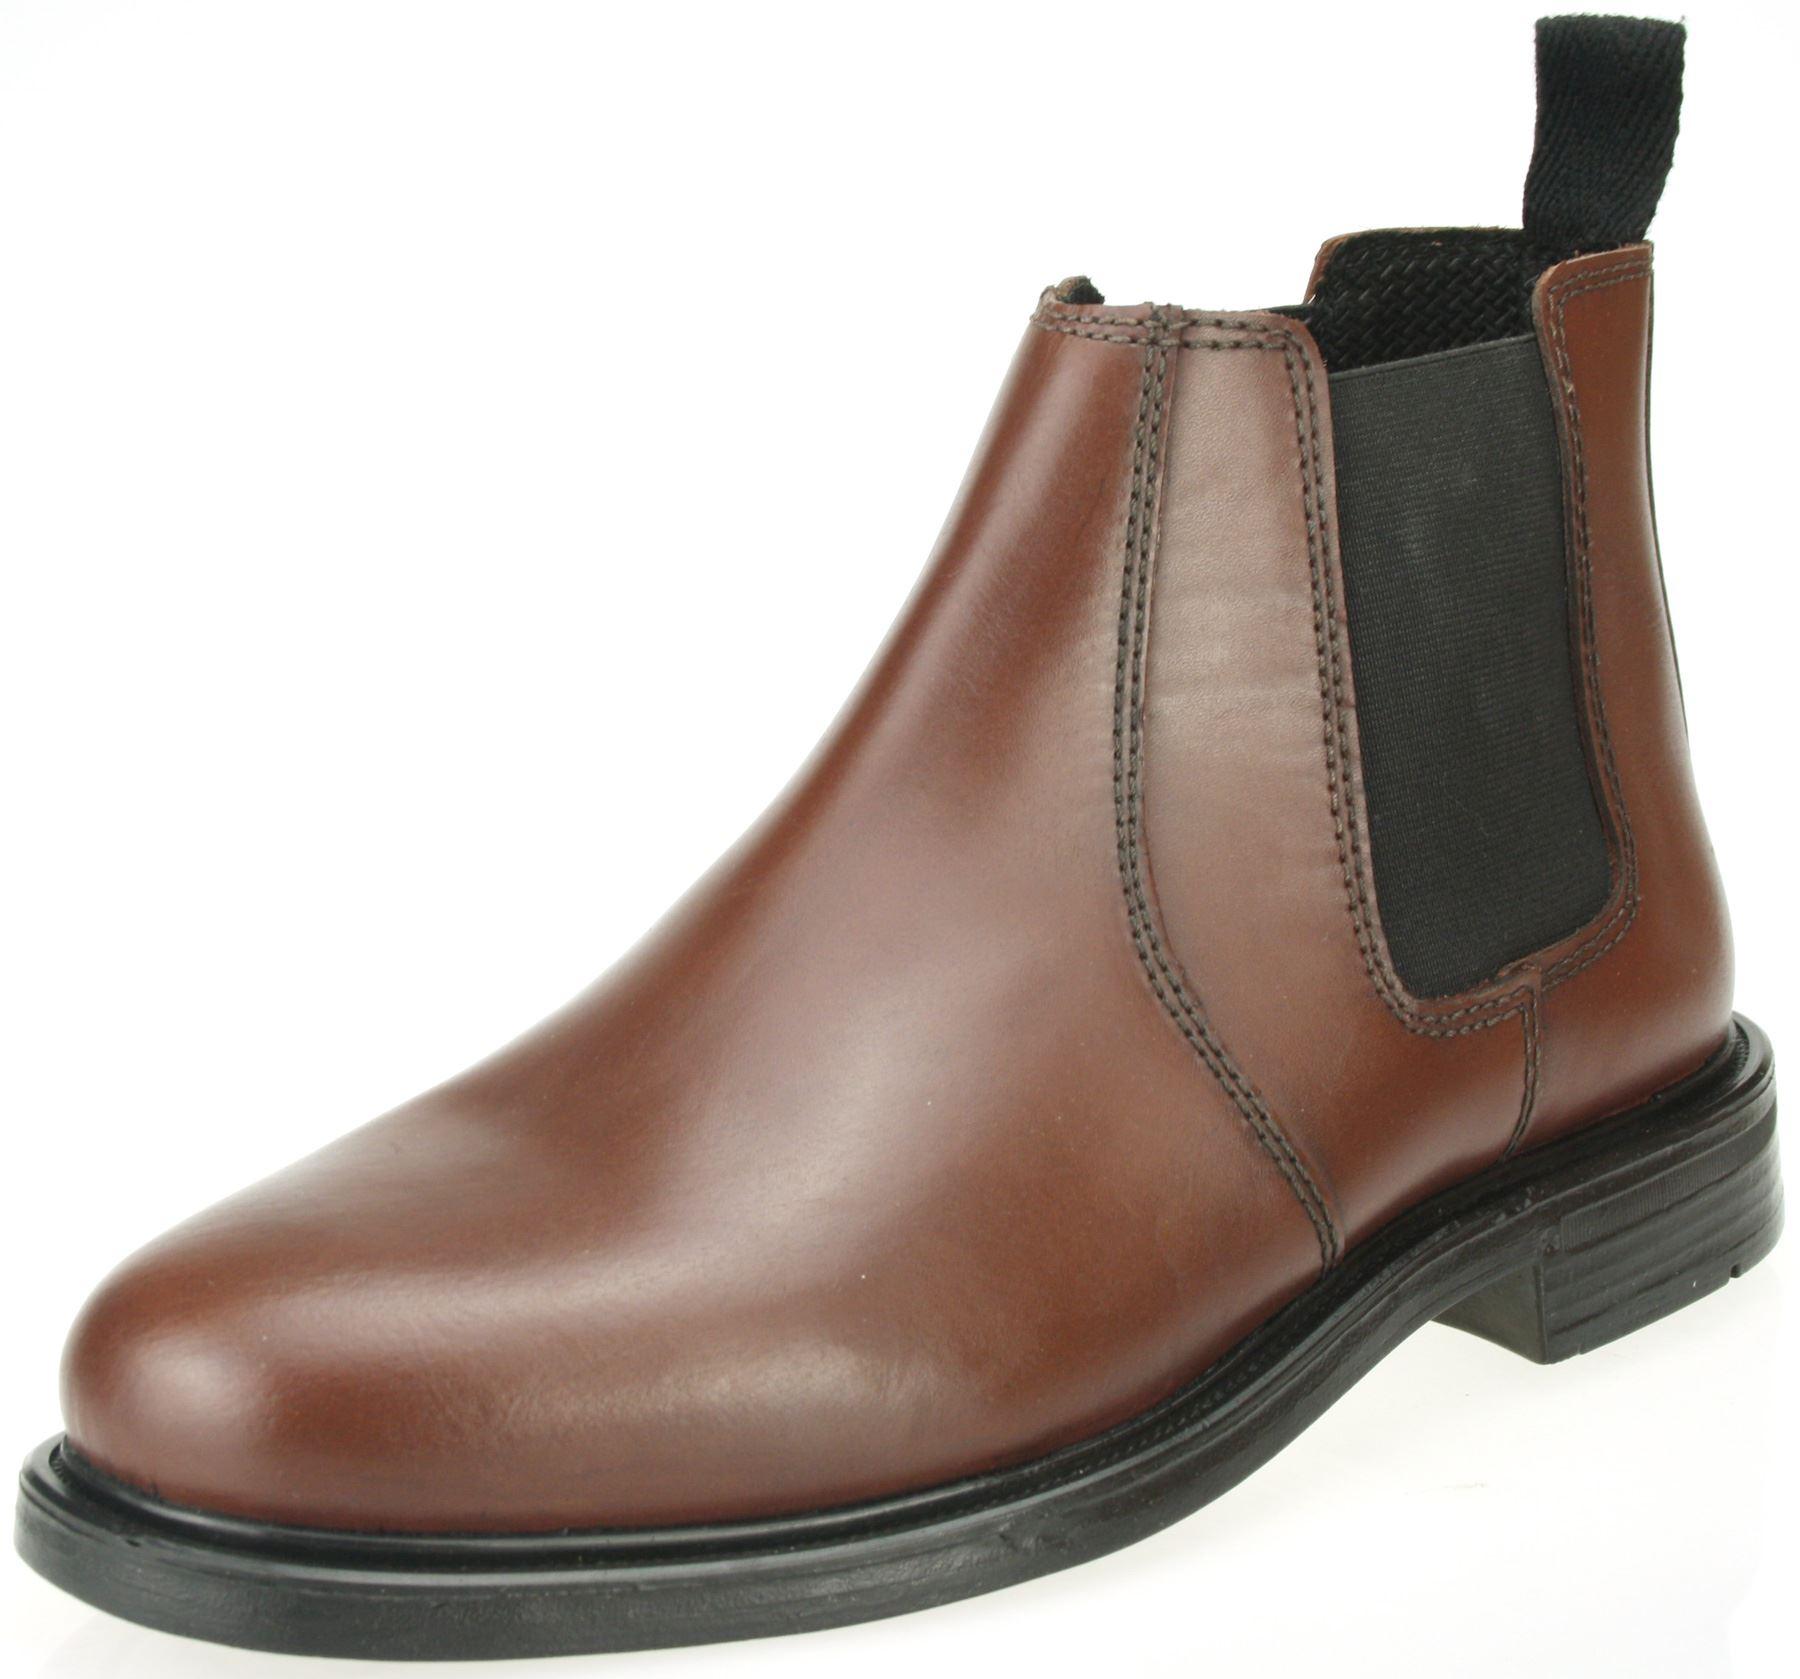 oaktrak mens bordo oxblood chestnut brown leather